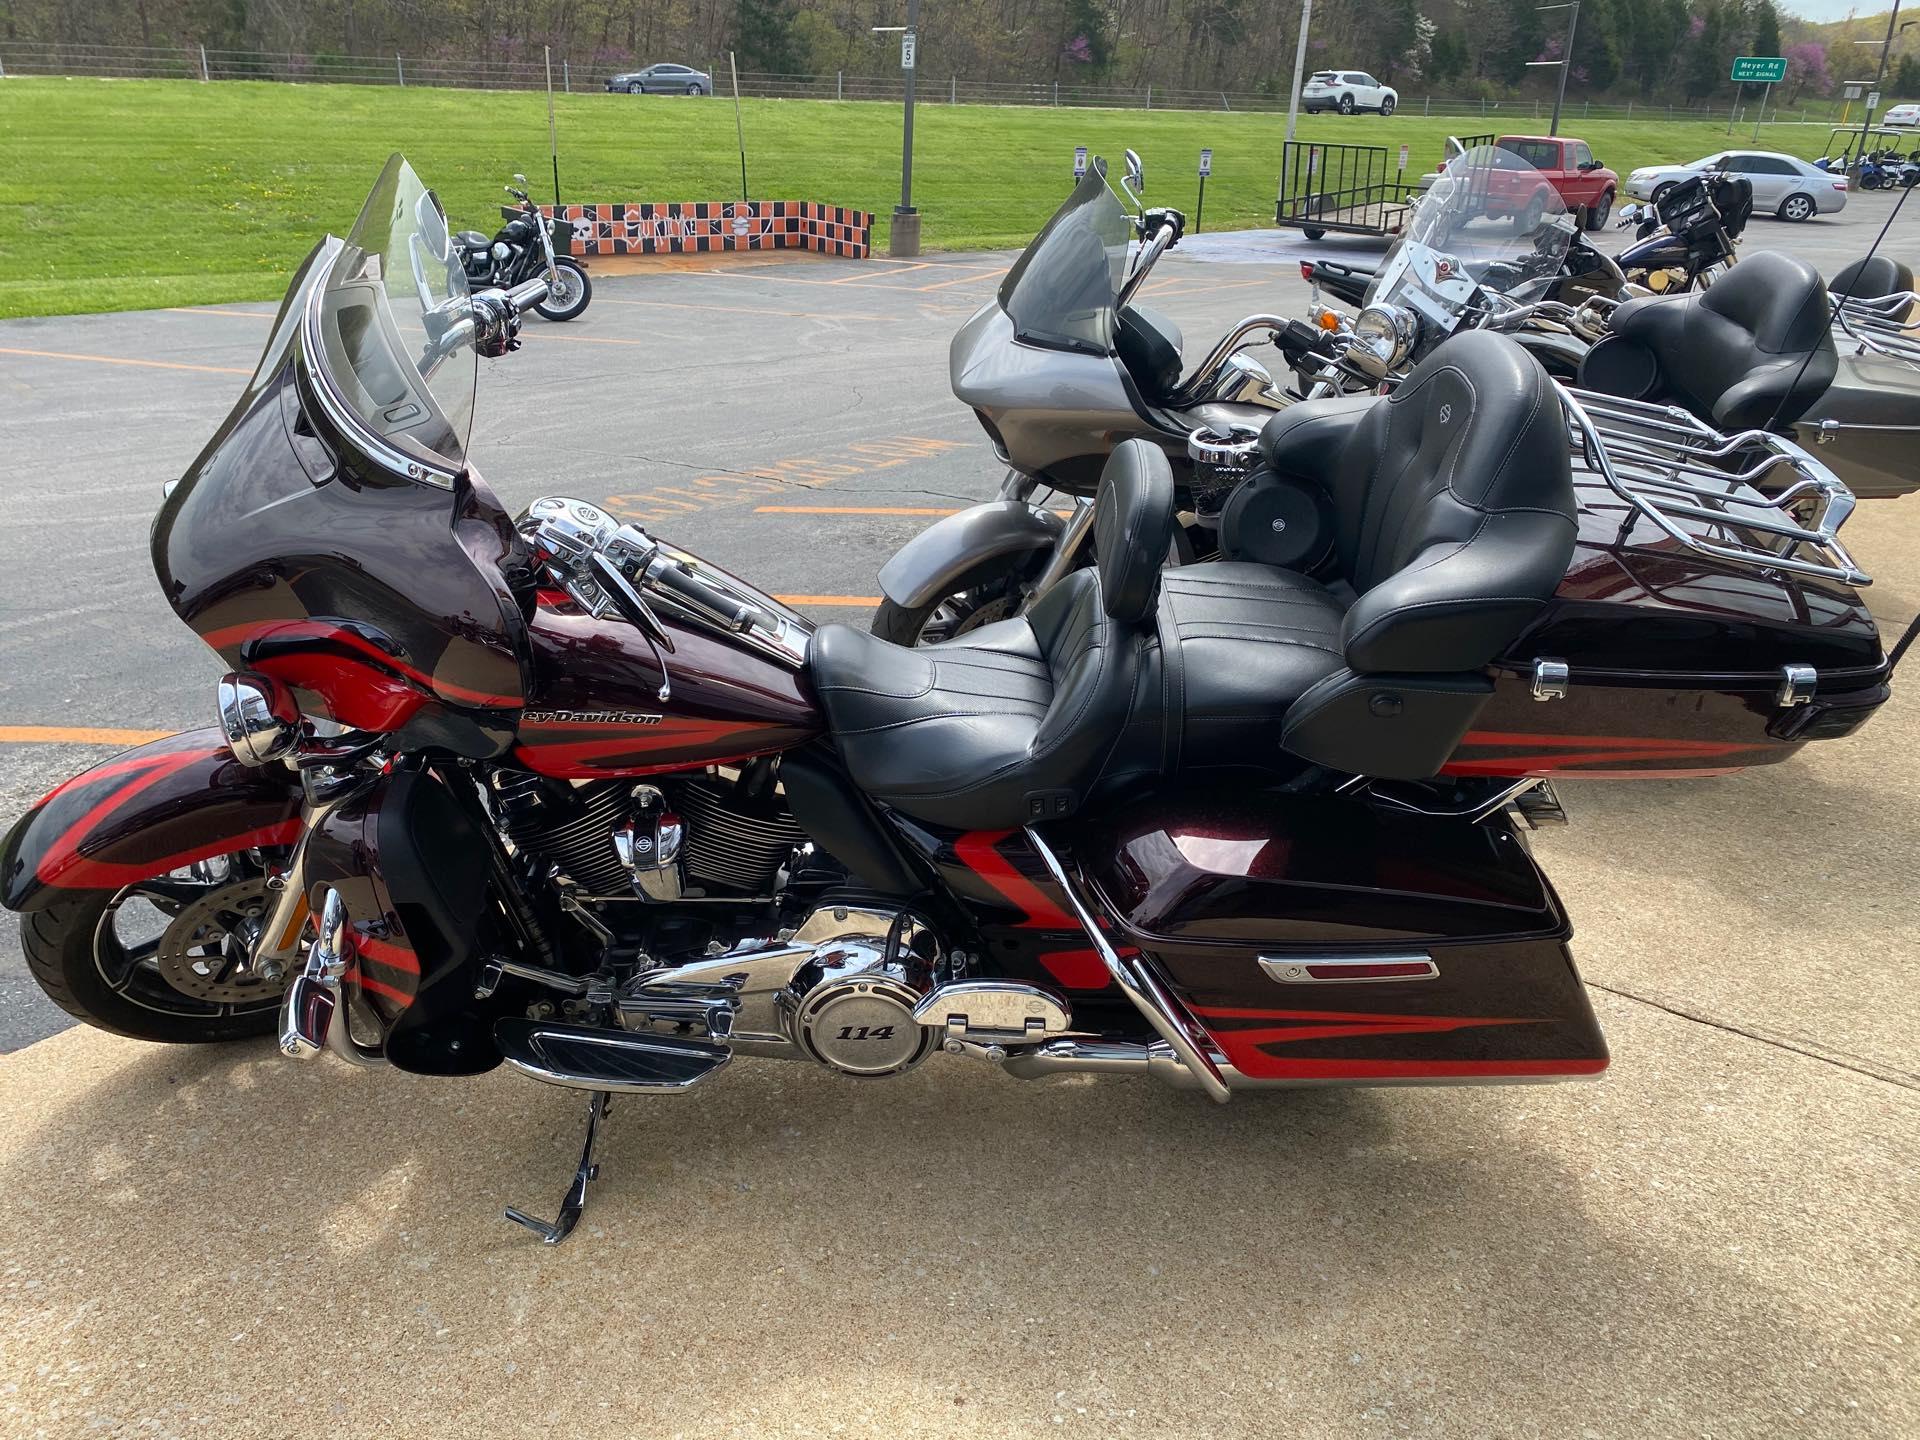 2017 Harley-Davidson Electra Glide CVO Limited at Gold Star Harley-Davidson